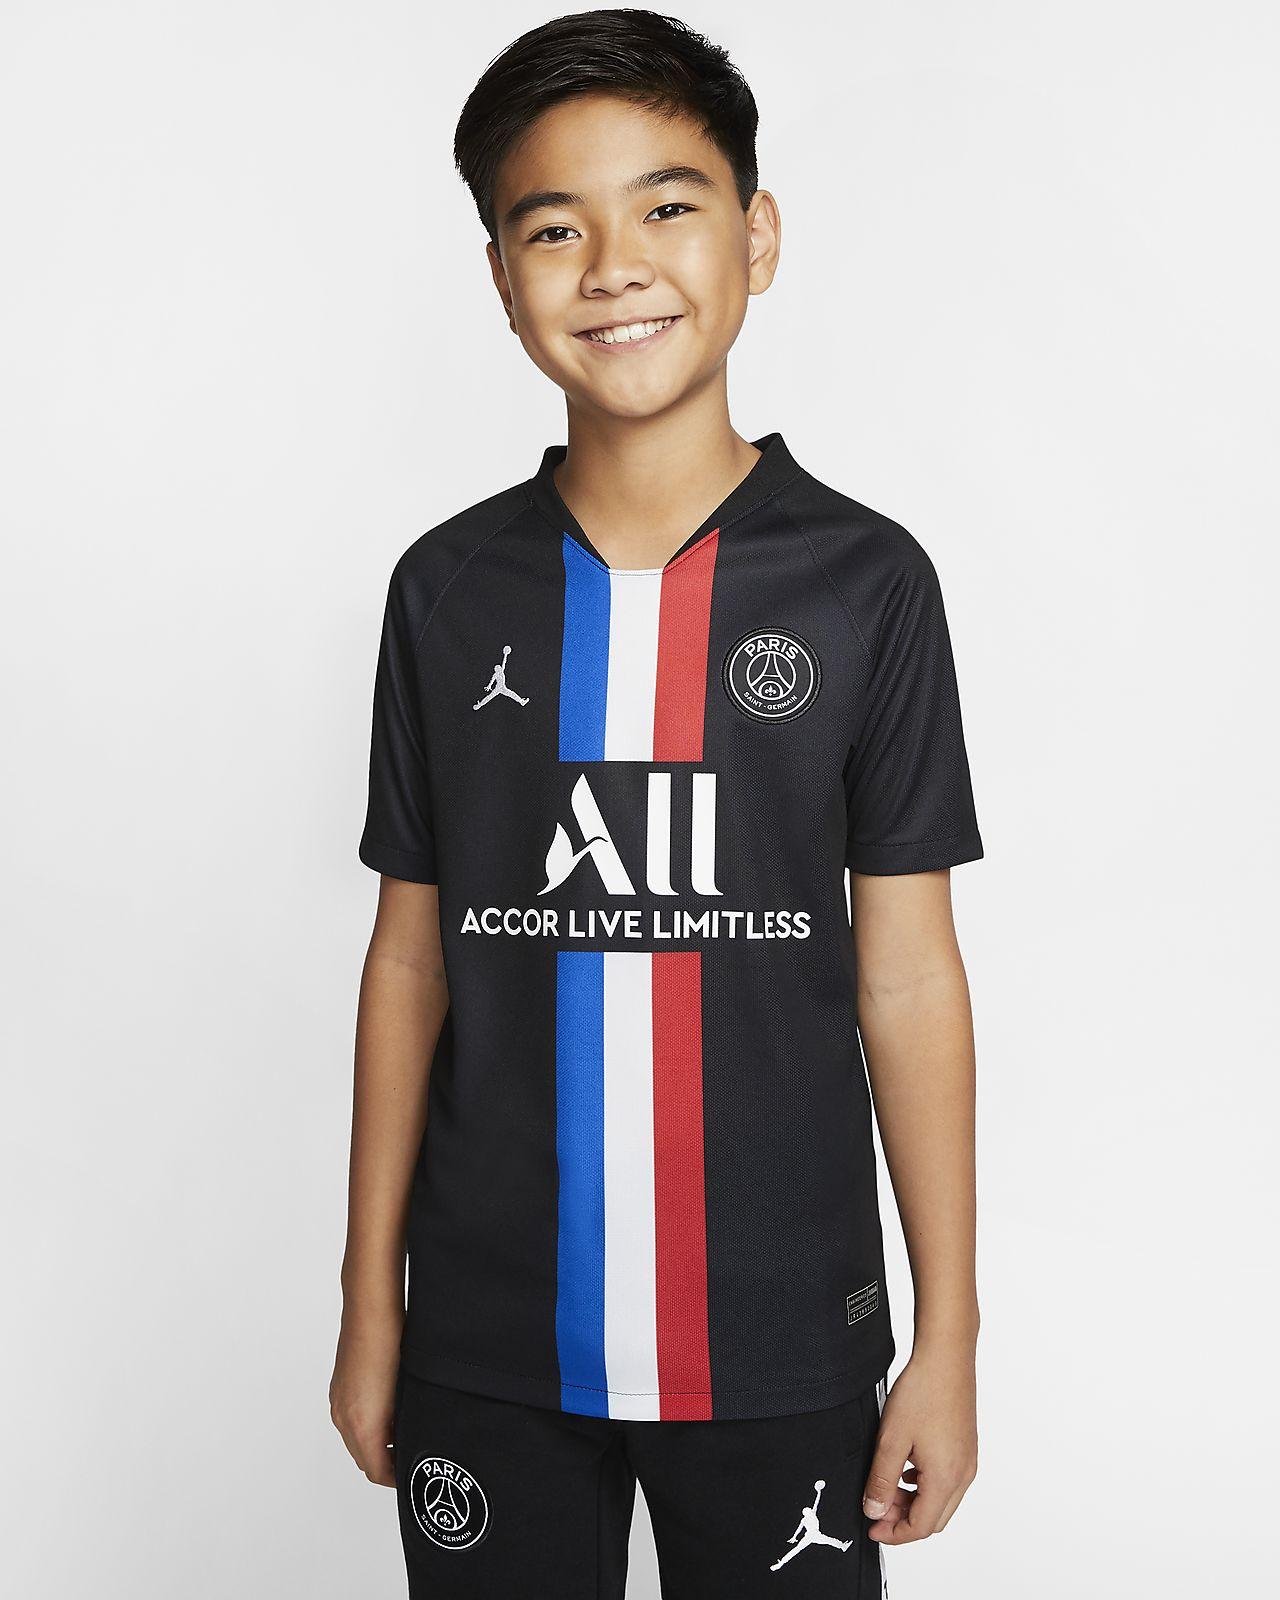 Čtvrtý fotbalový dres Jordan x Paris Saint-Germain 2019/20 Stadium pro větší děti